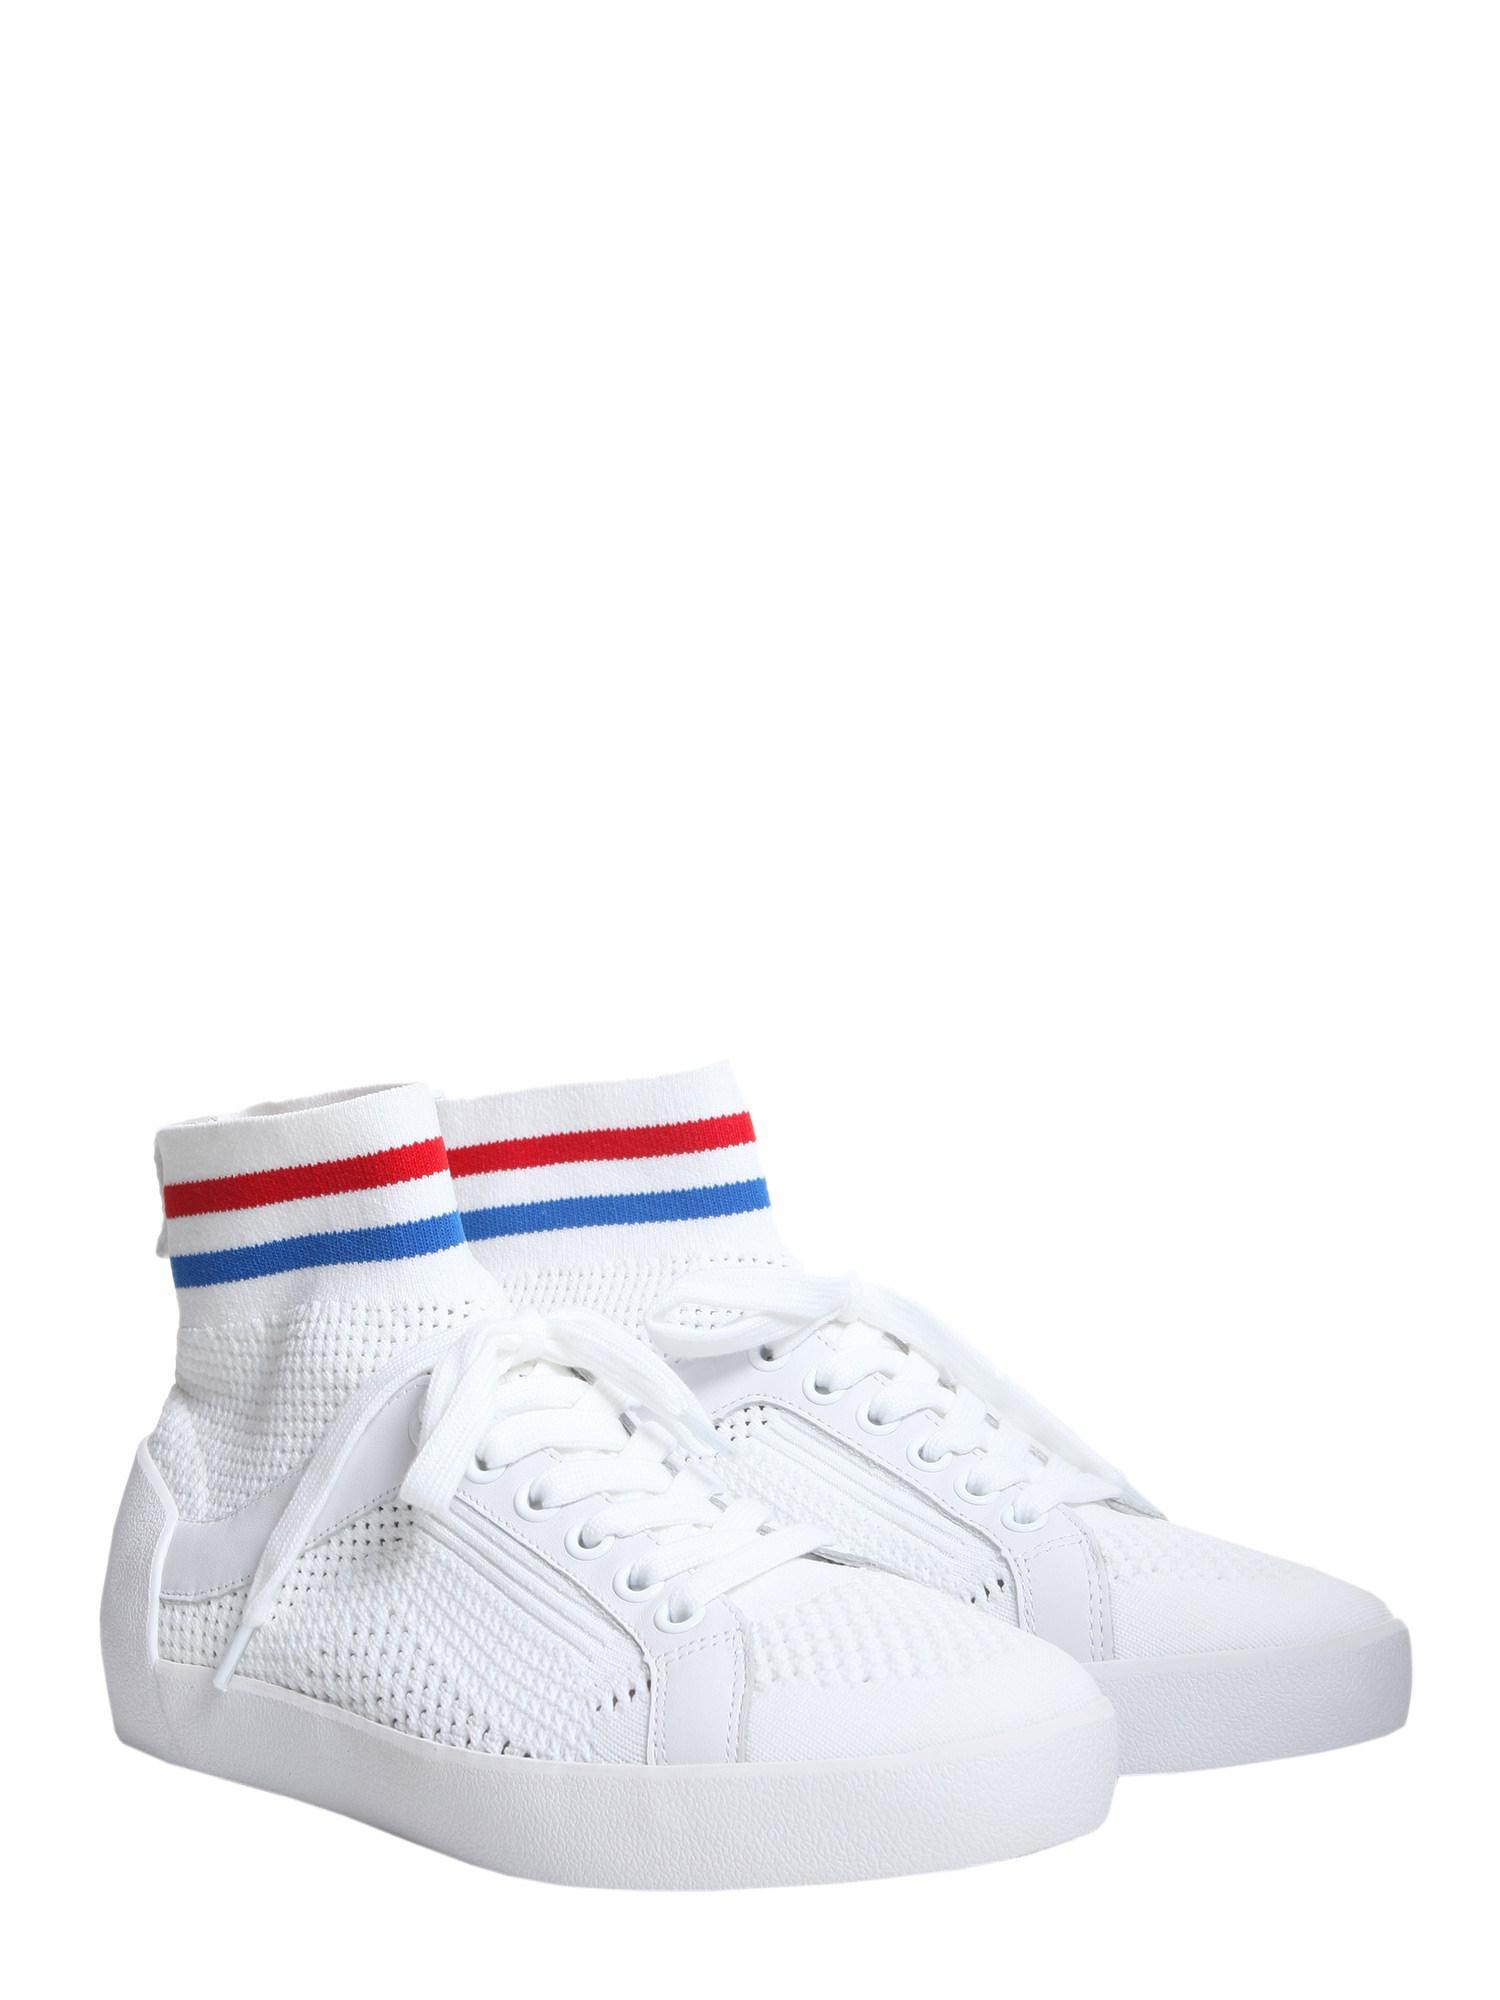 White Ninja pierced sneakers Ash Cost Cheap Sale Latest Sale Sast 4MOC8jHey